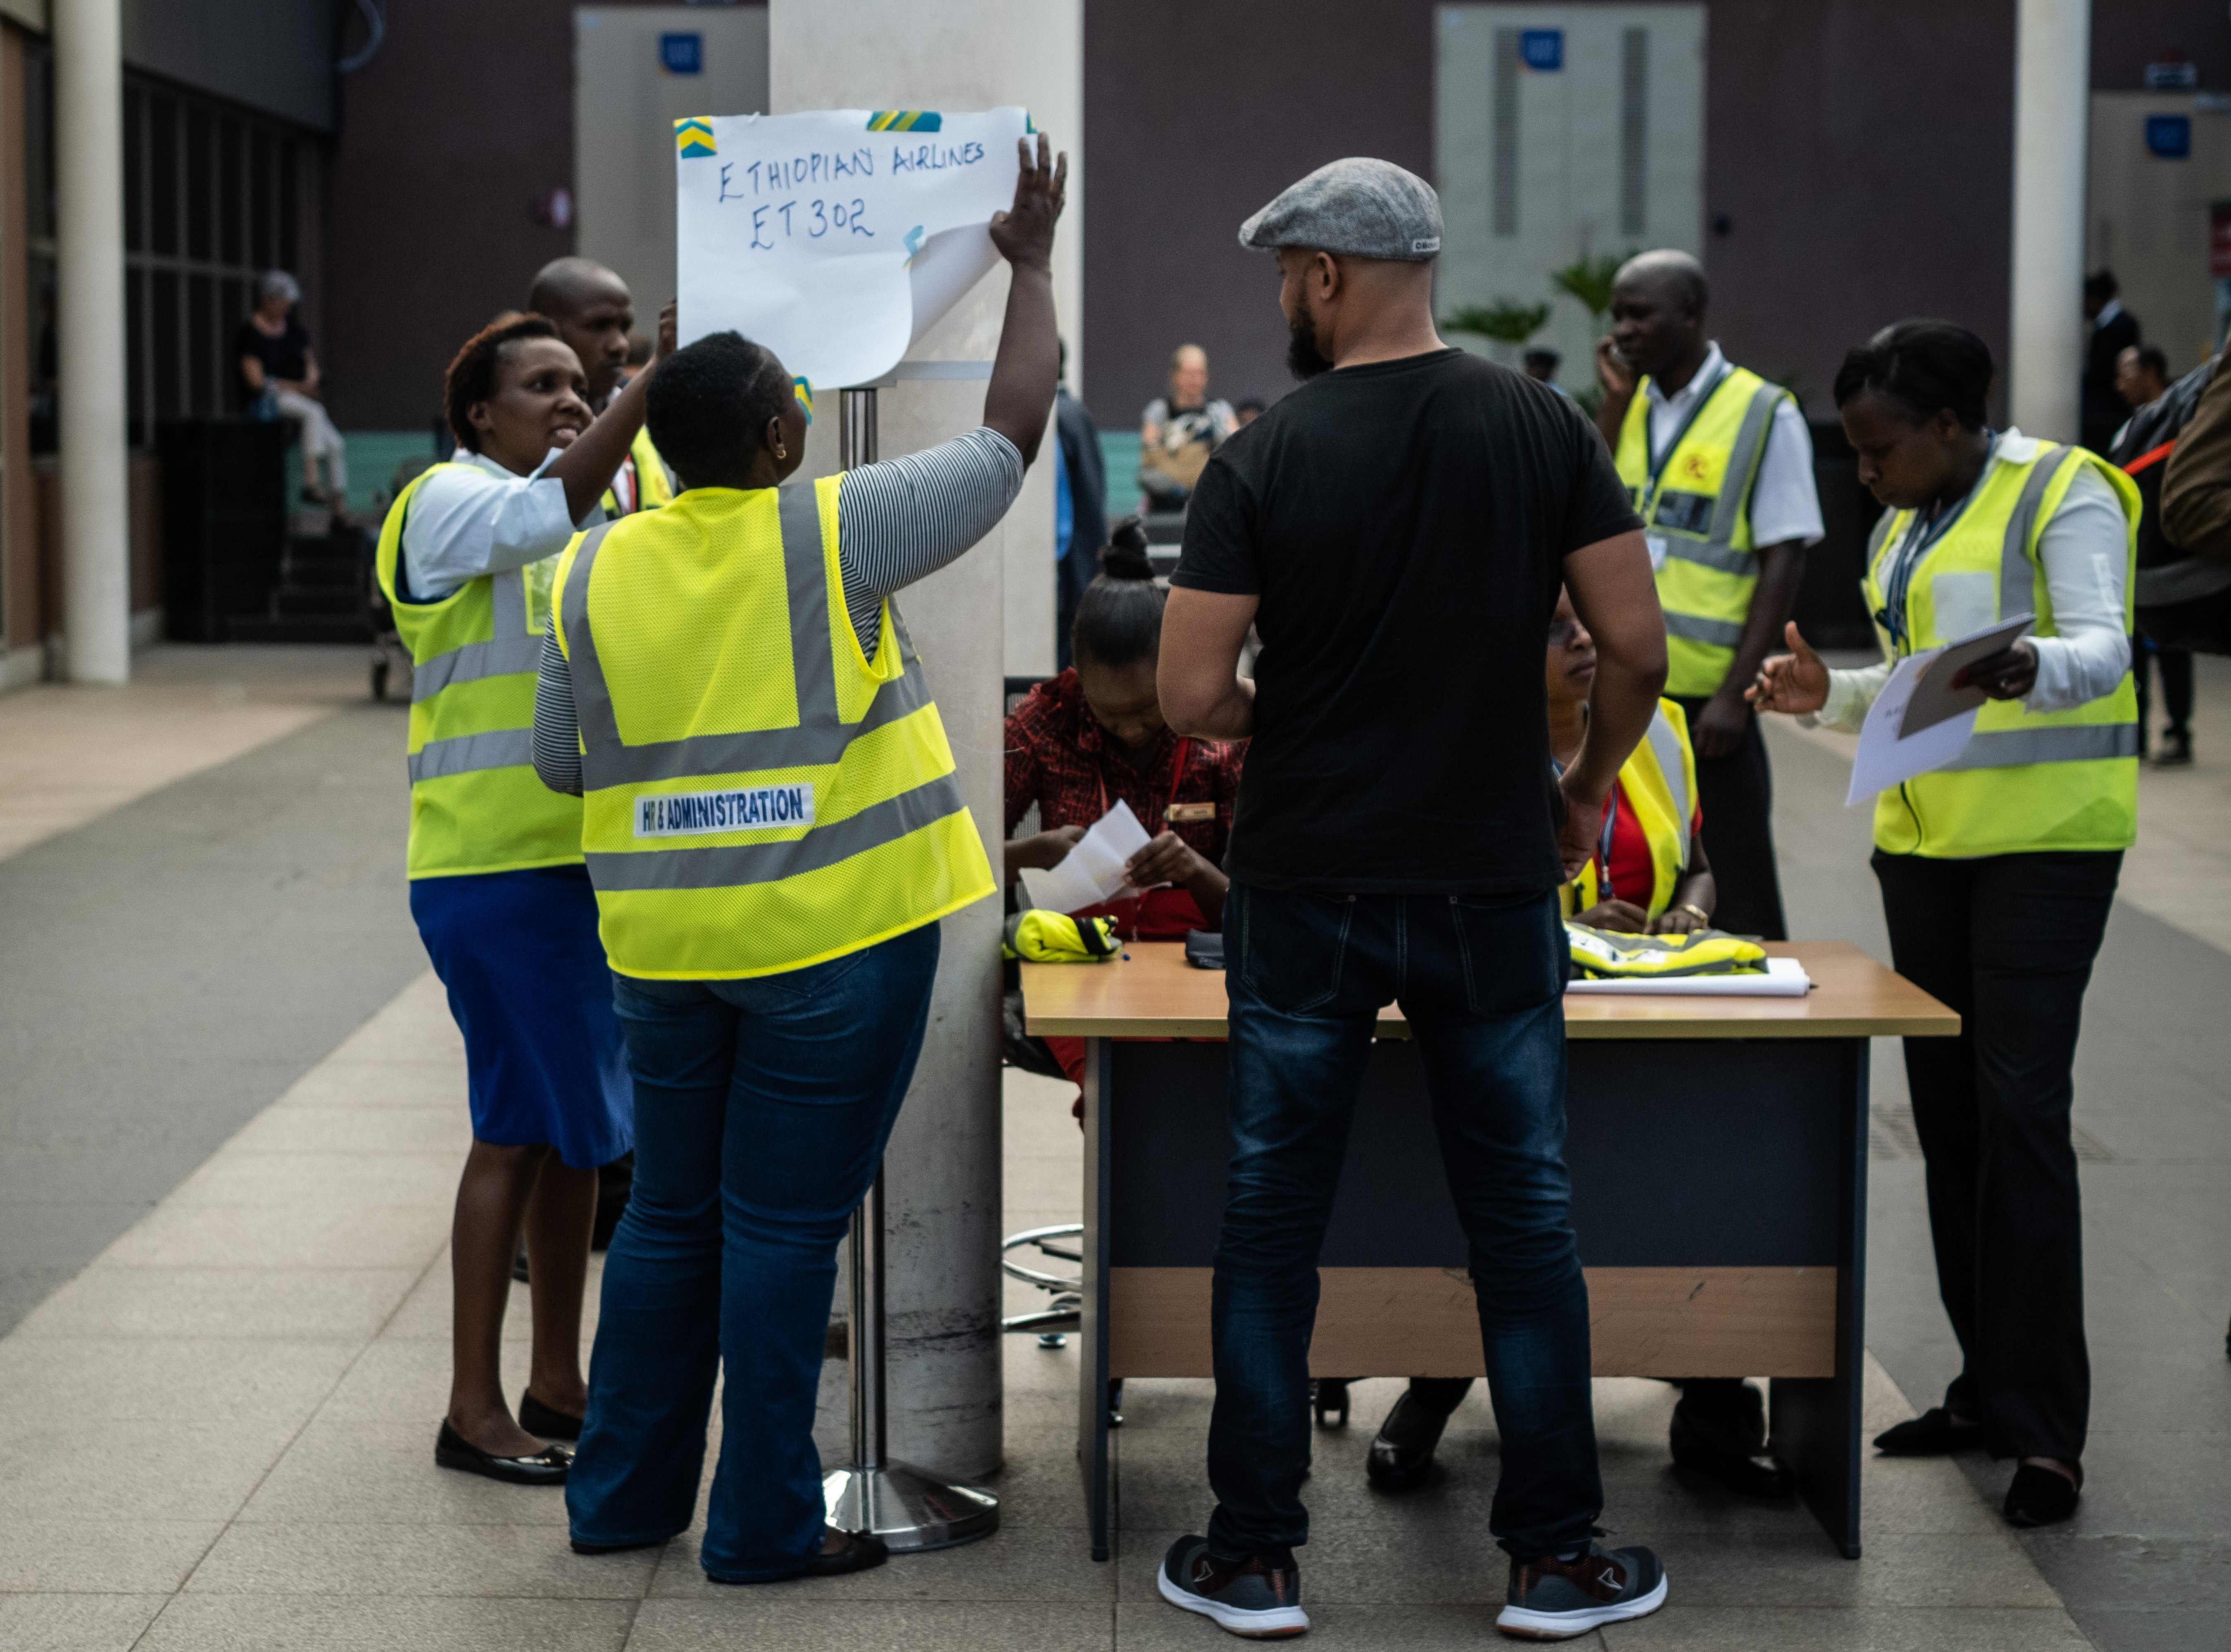 Airport staff setup a help desk at Jomo Kenyatta International Airport in Nairobi, Kenya to get information about the Ethiopia Airlines flight.